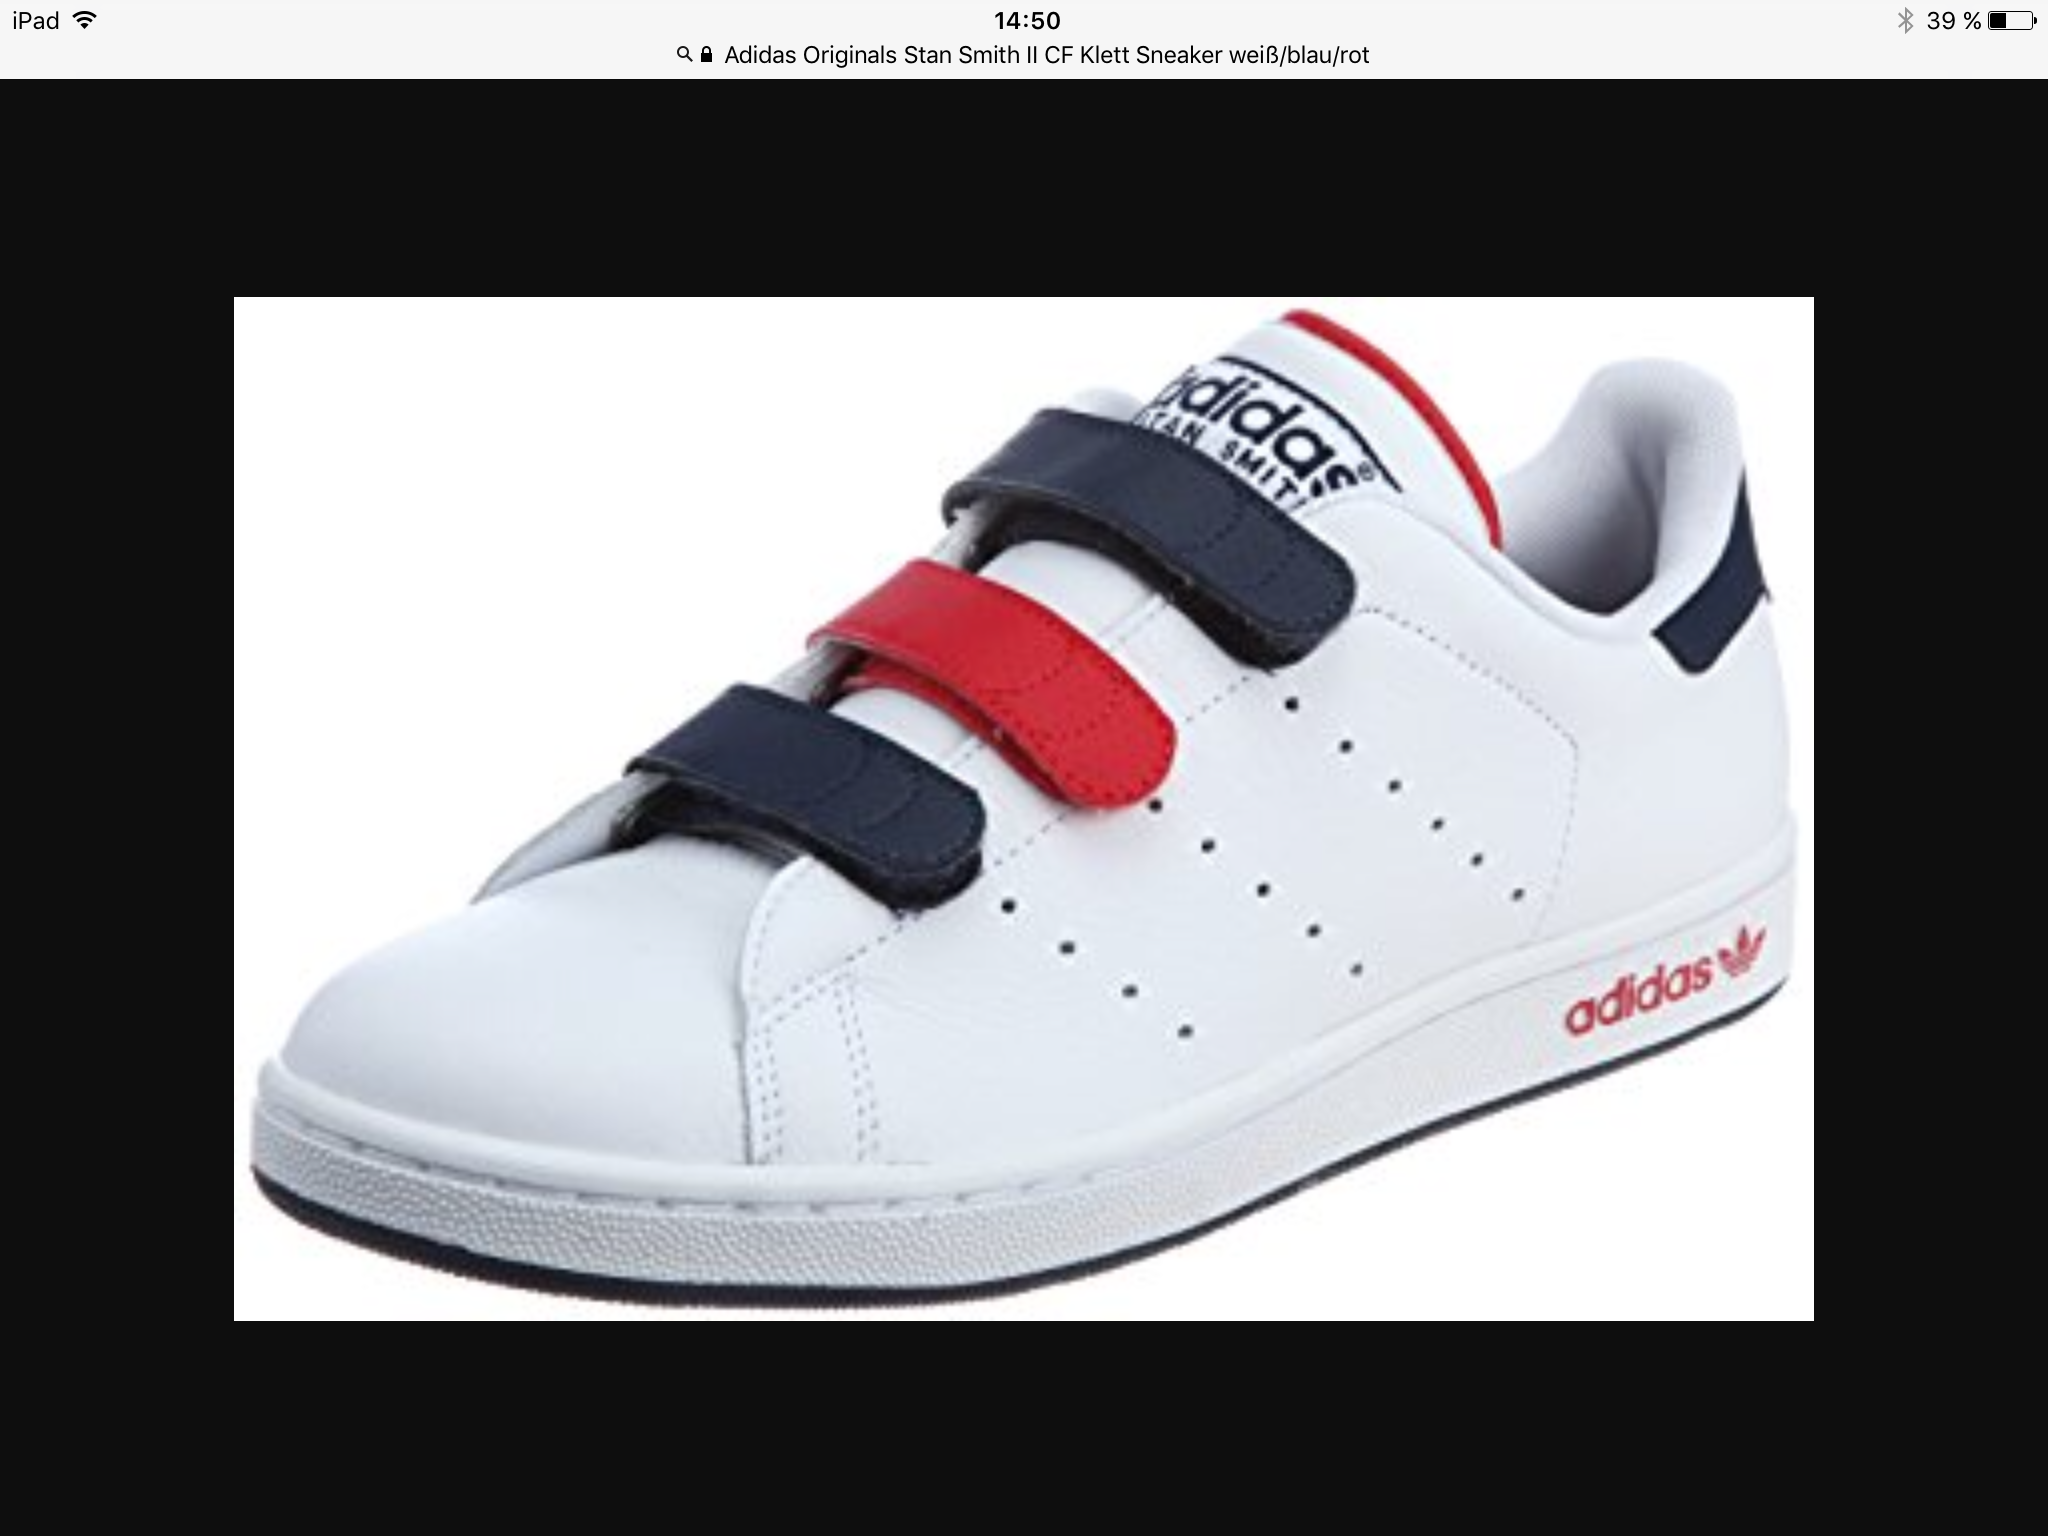 große Auswahl adidas Stan Smith CF Schuhe Weiß Winrot